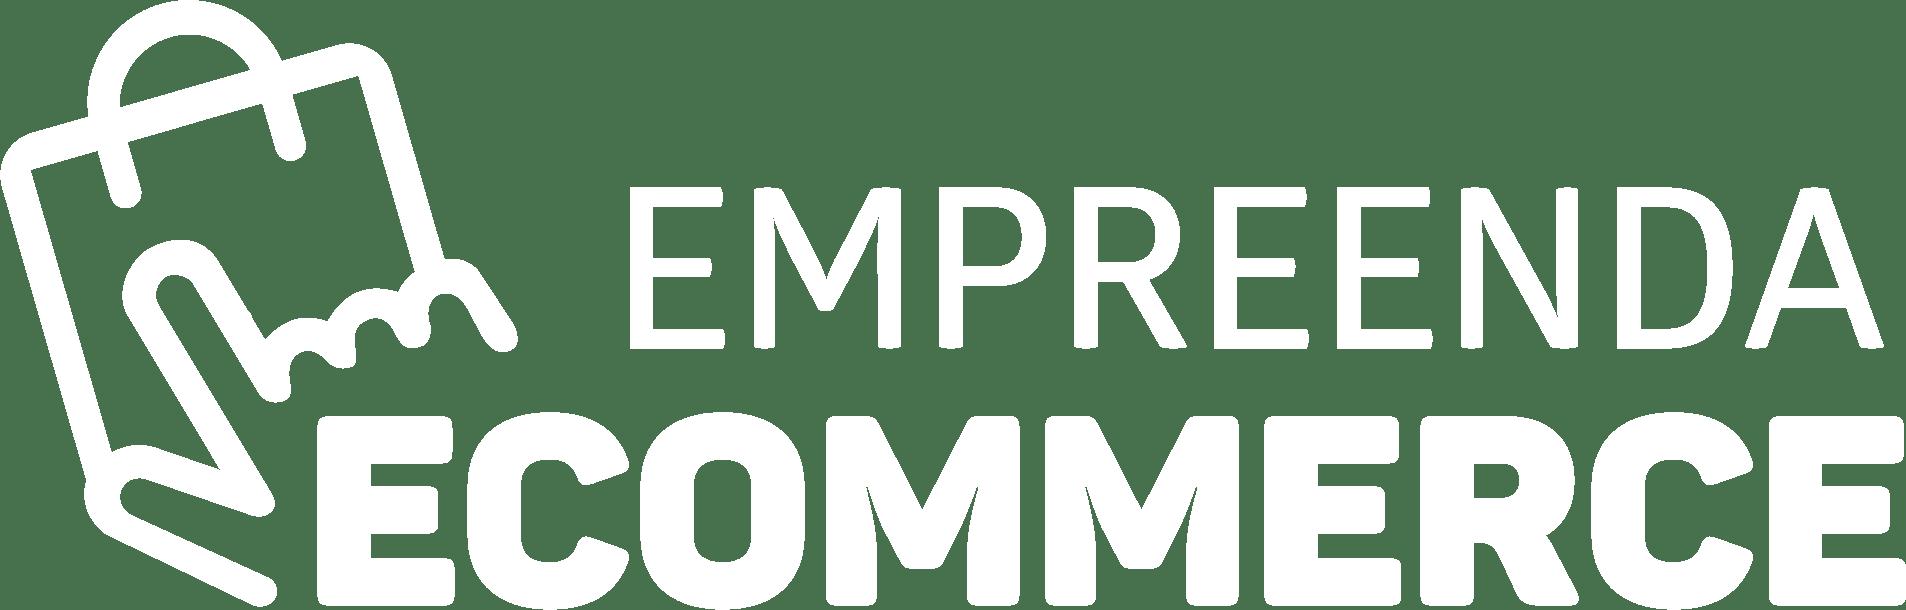 Empreenda Ecommerce